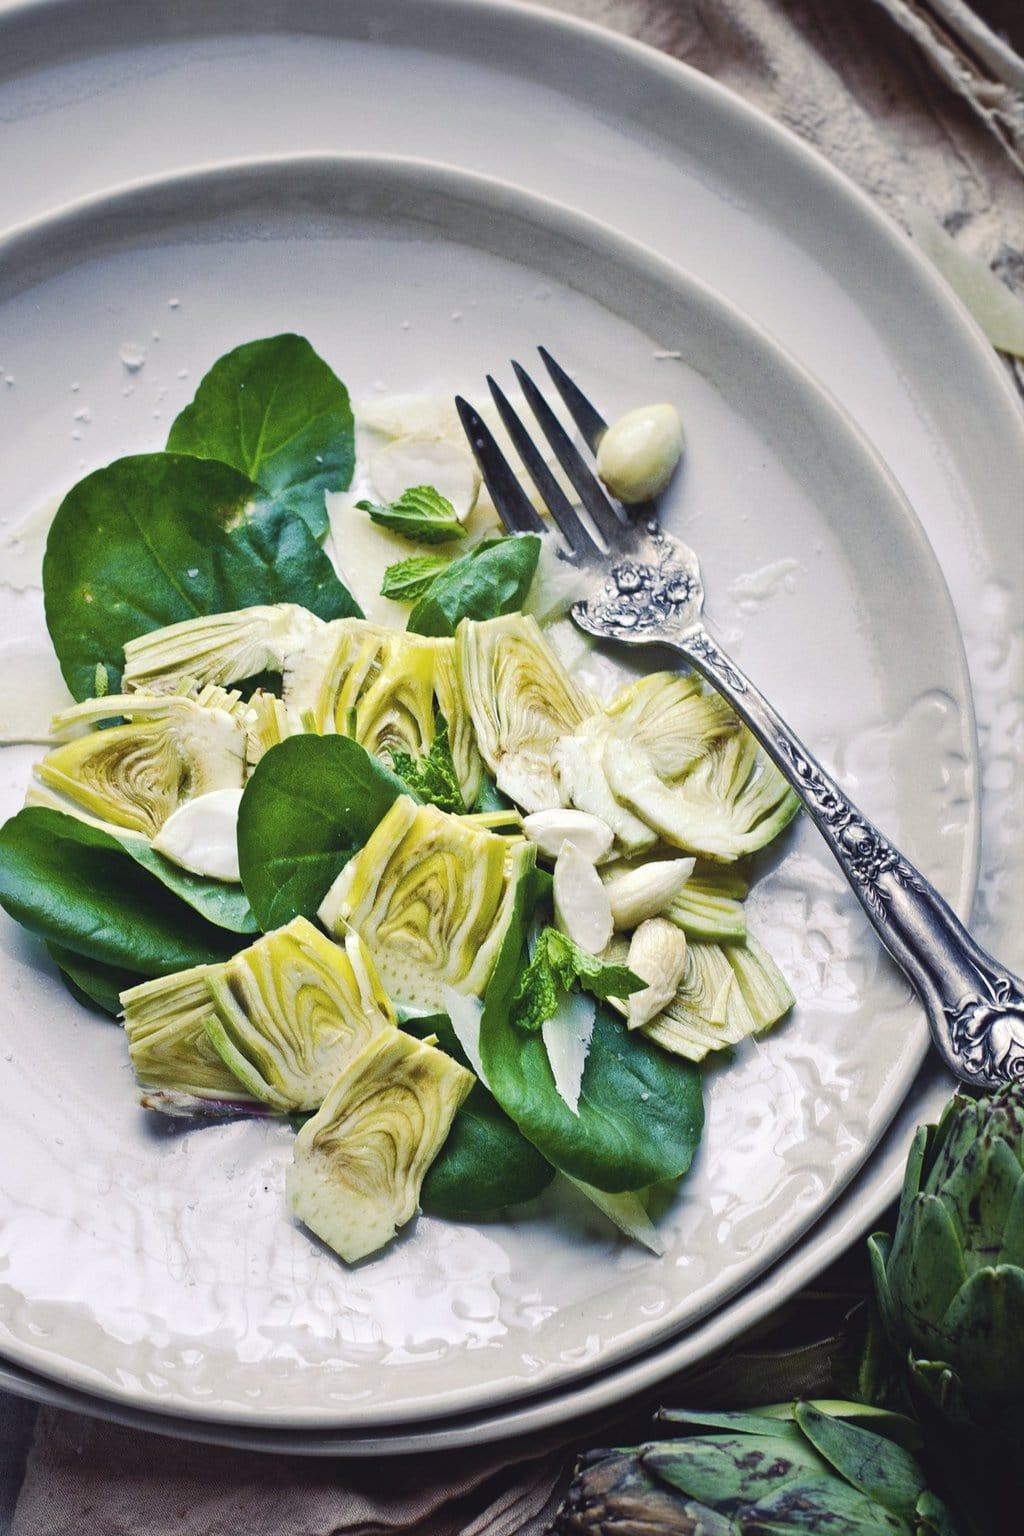 20 Best Recipes of 2014 | Raw Artichoke Salad via Thou Swell https://thouswell.com/